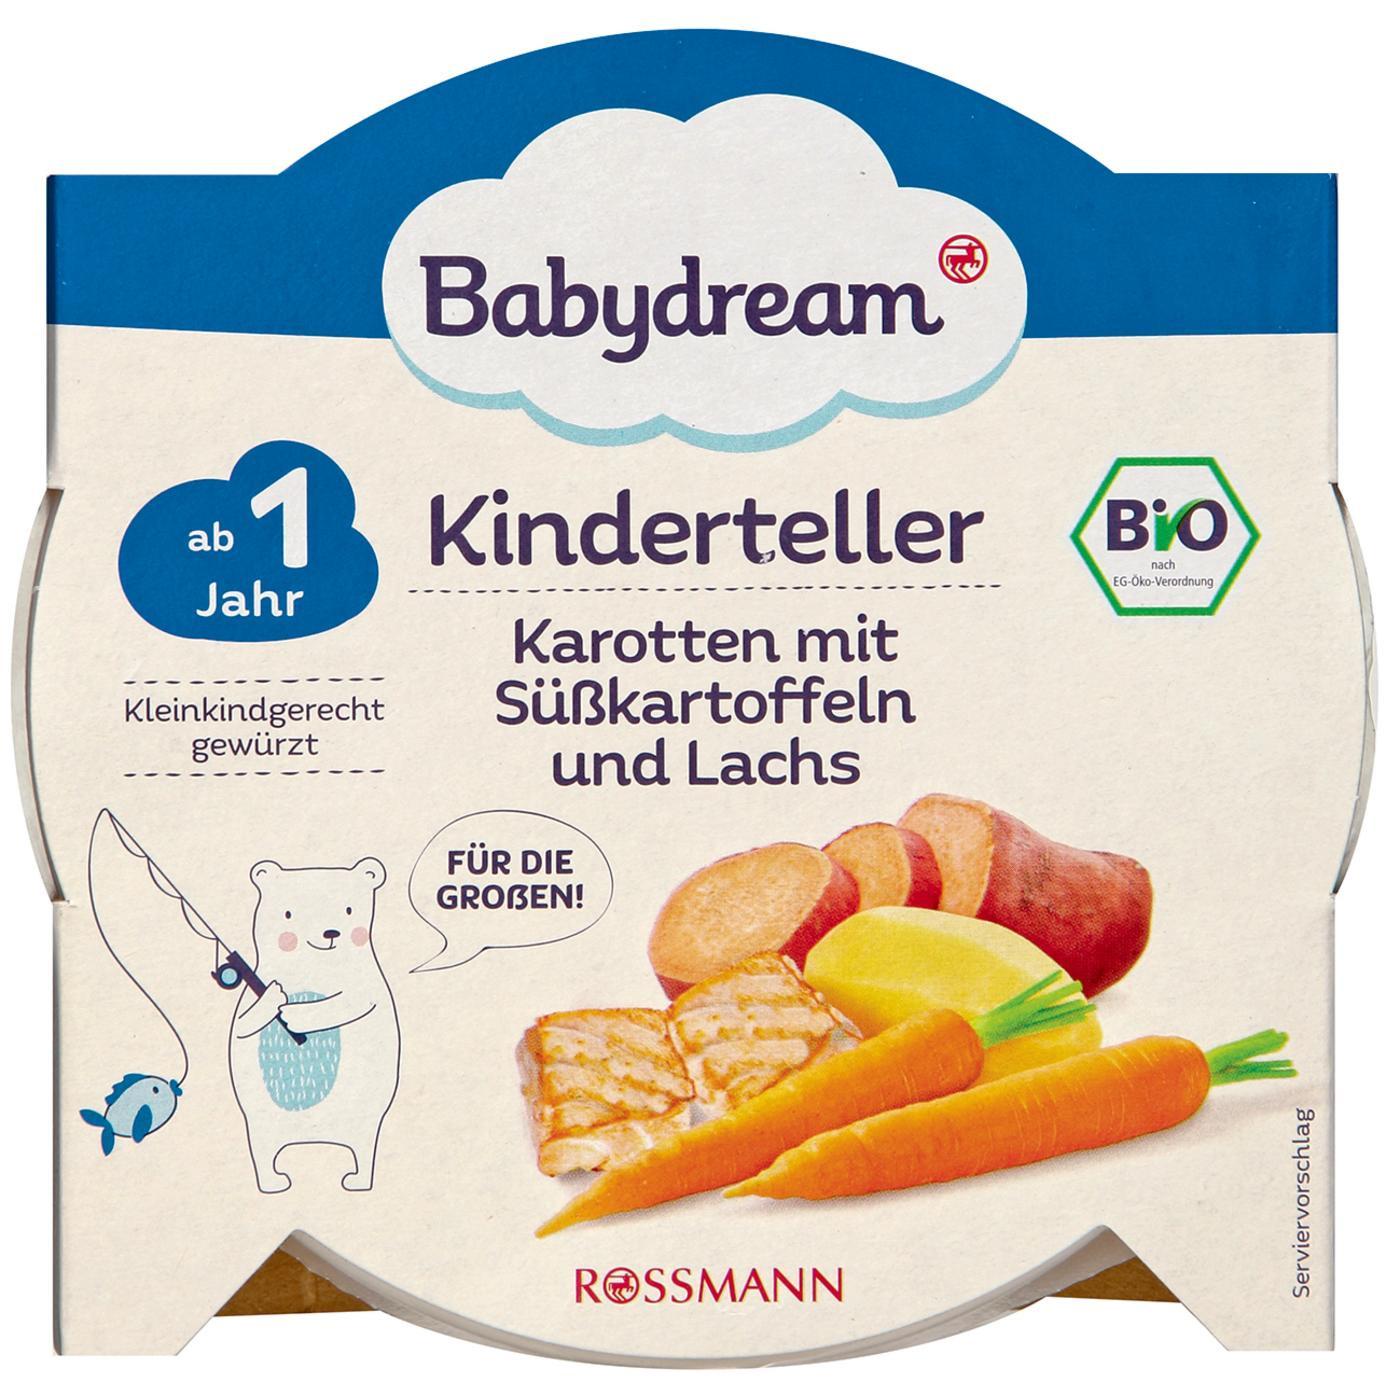 6d6c29d72b28e4 Babydream Bio Kinderteller Karotten mit Süßkartoffeln   Lachs ...